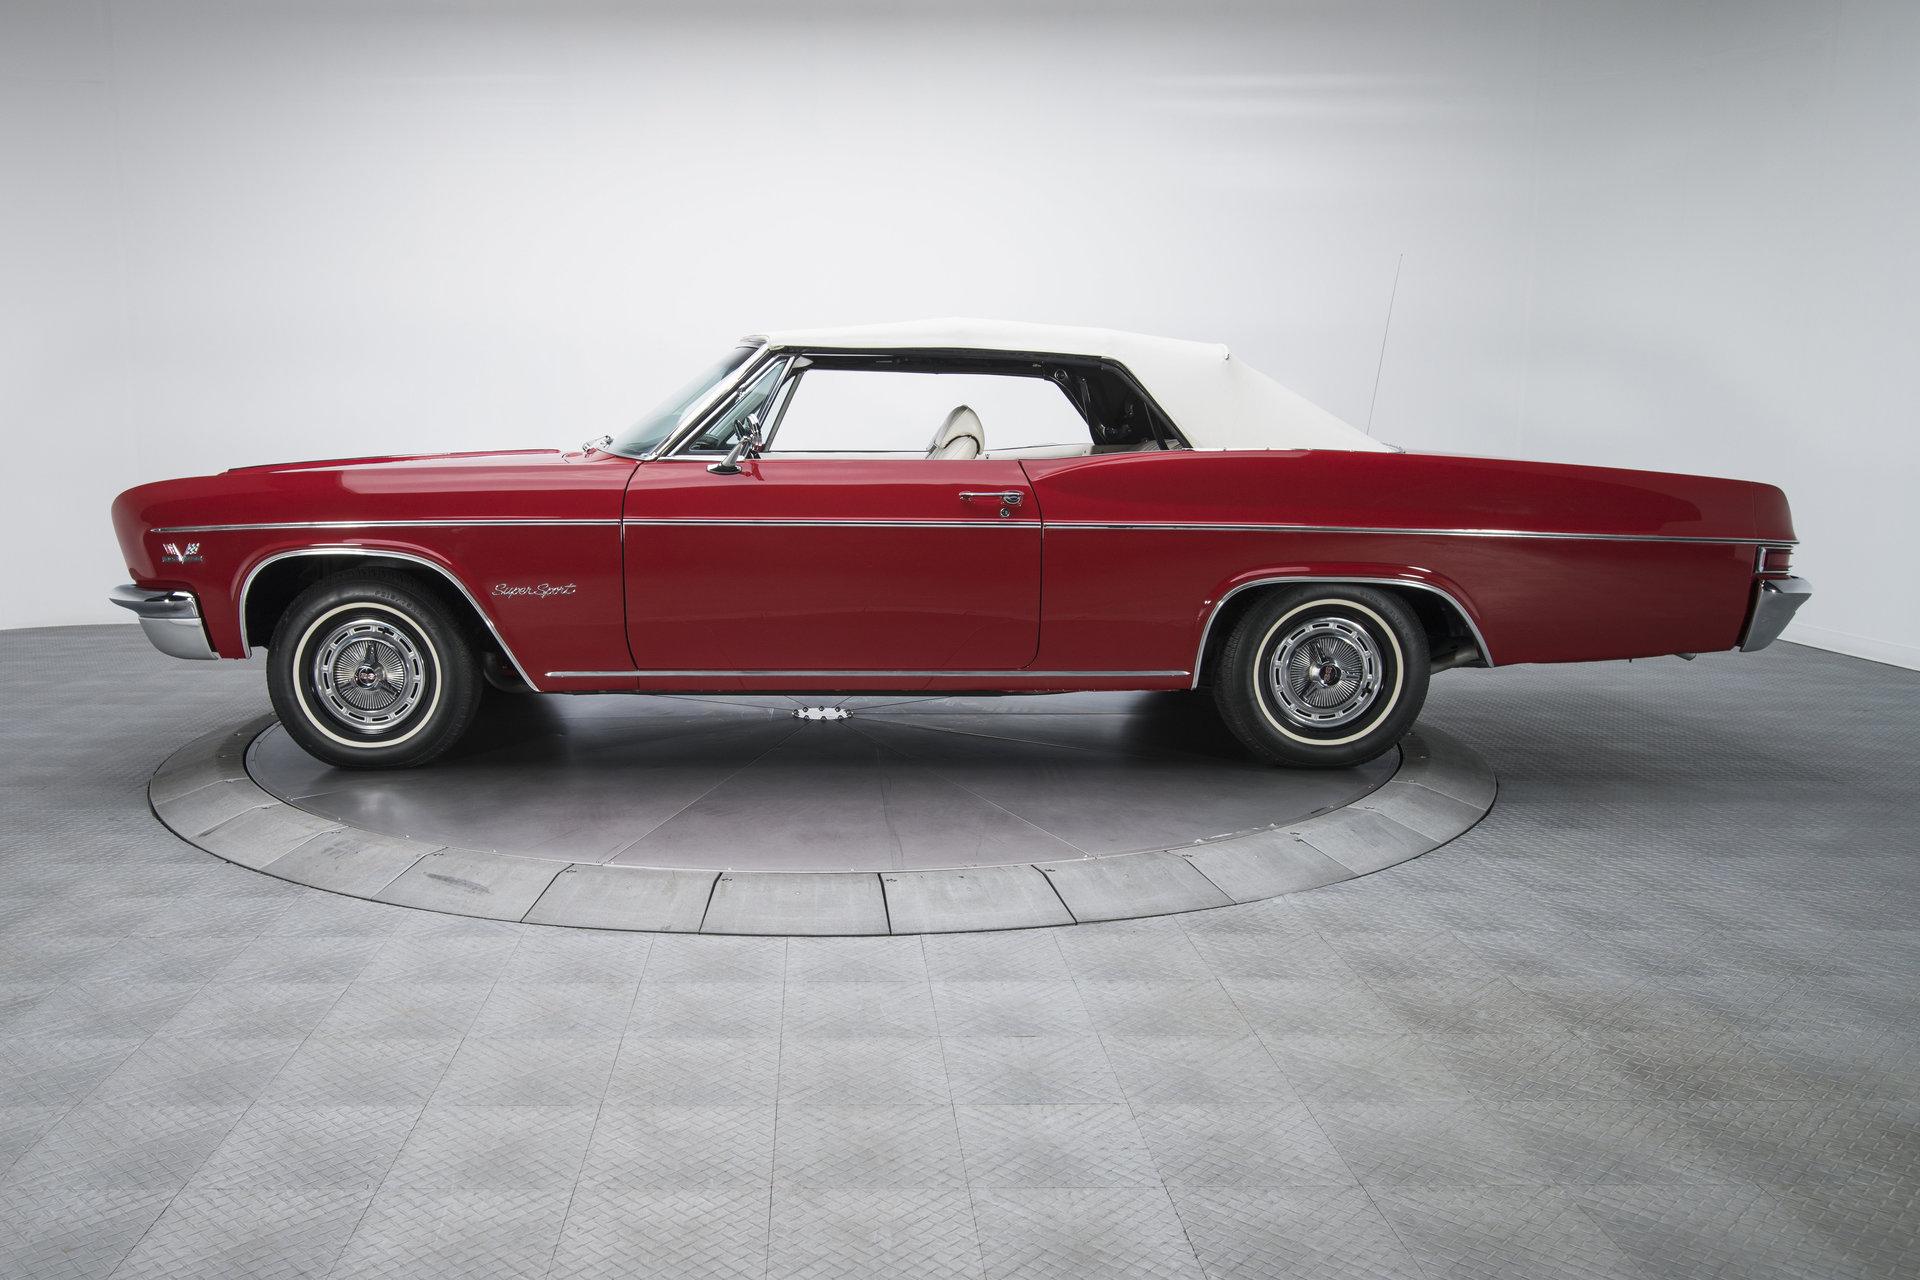 135978 1966 Chevrolet Impala Rk Motors Classic Cars For Sale Super Sport